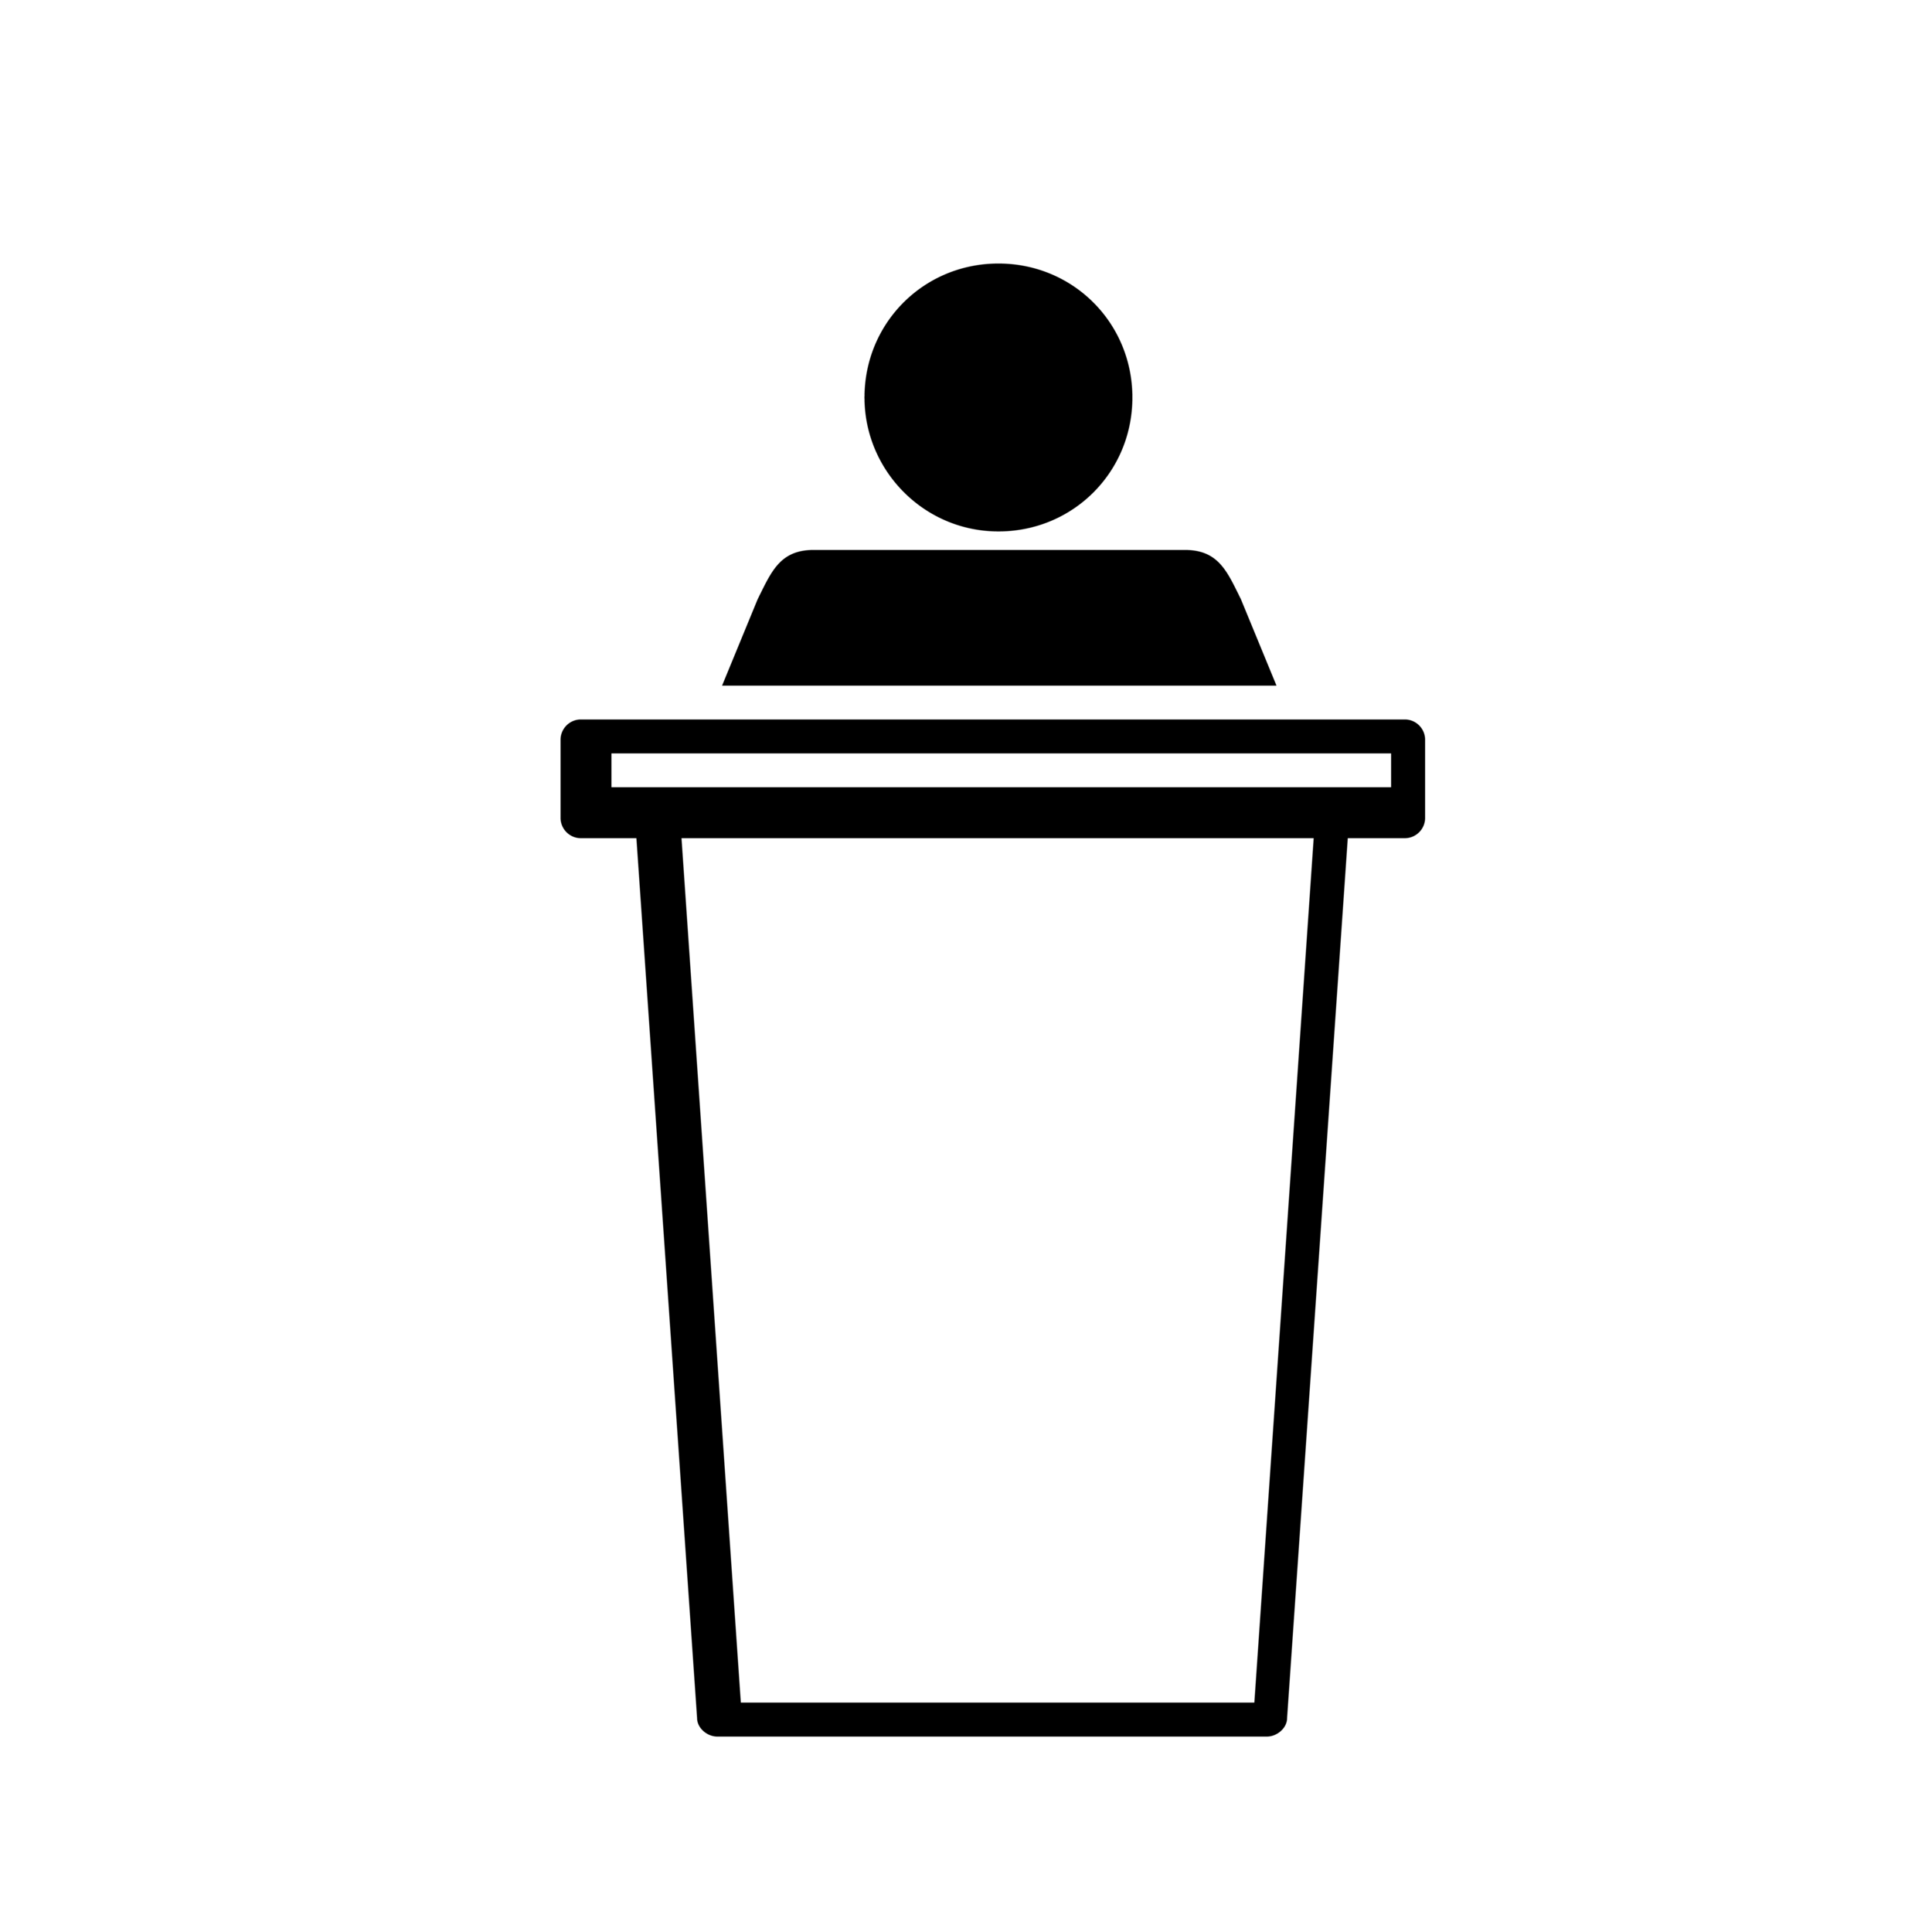 Podium-01.png